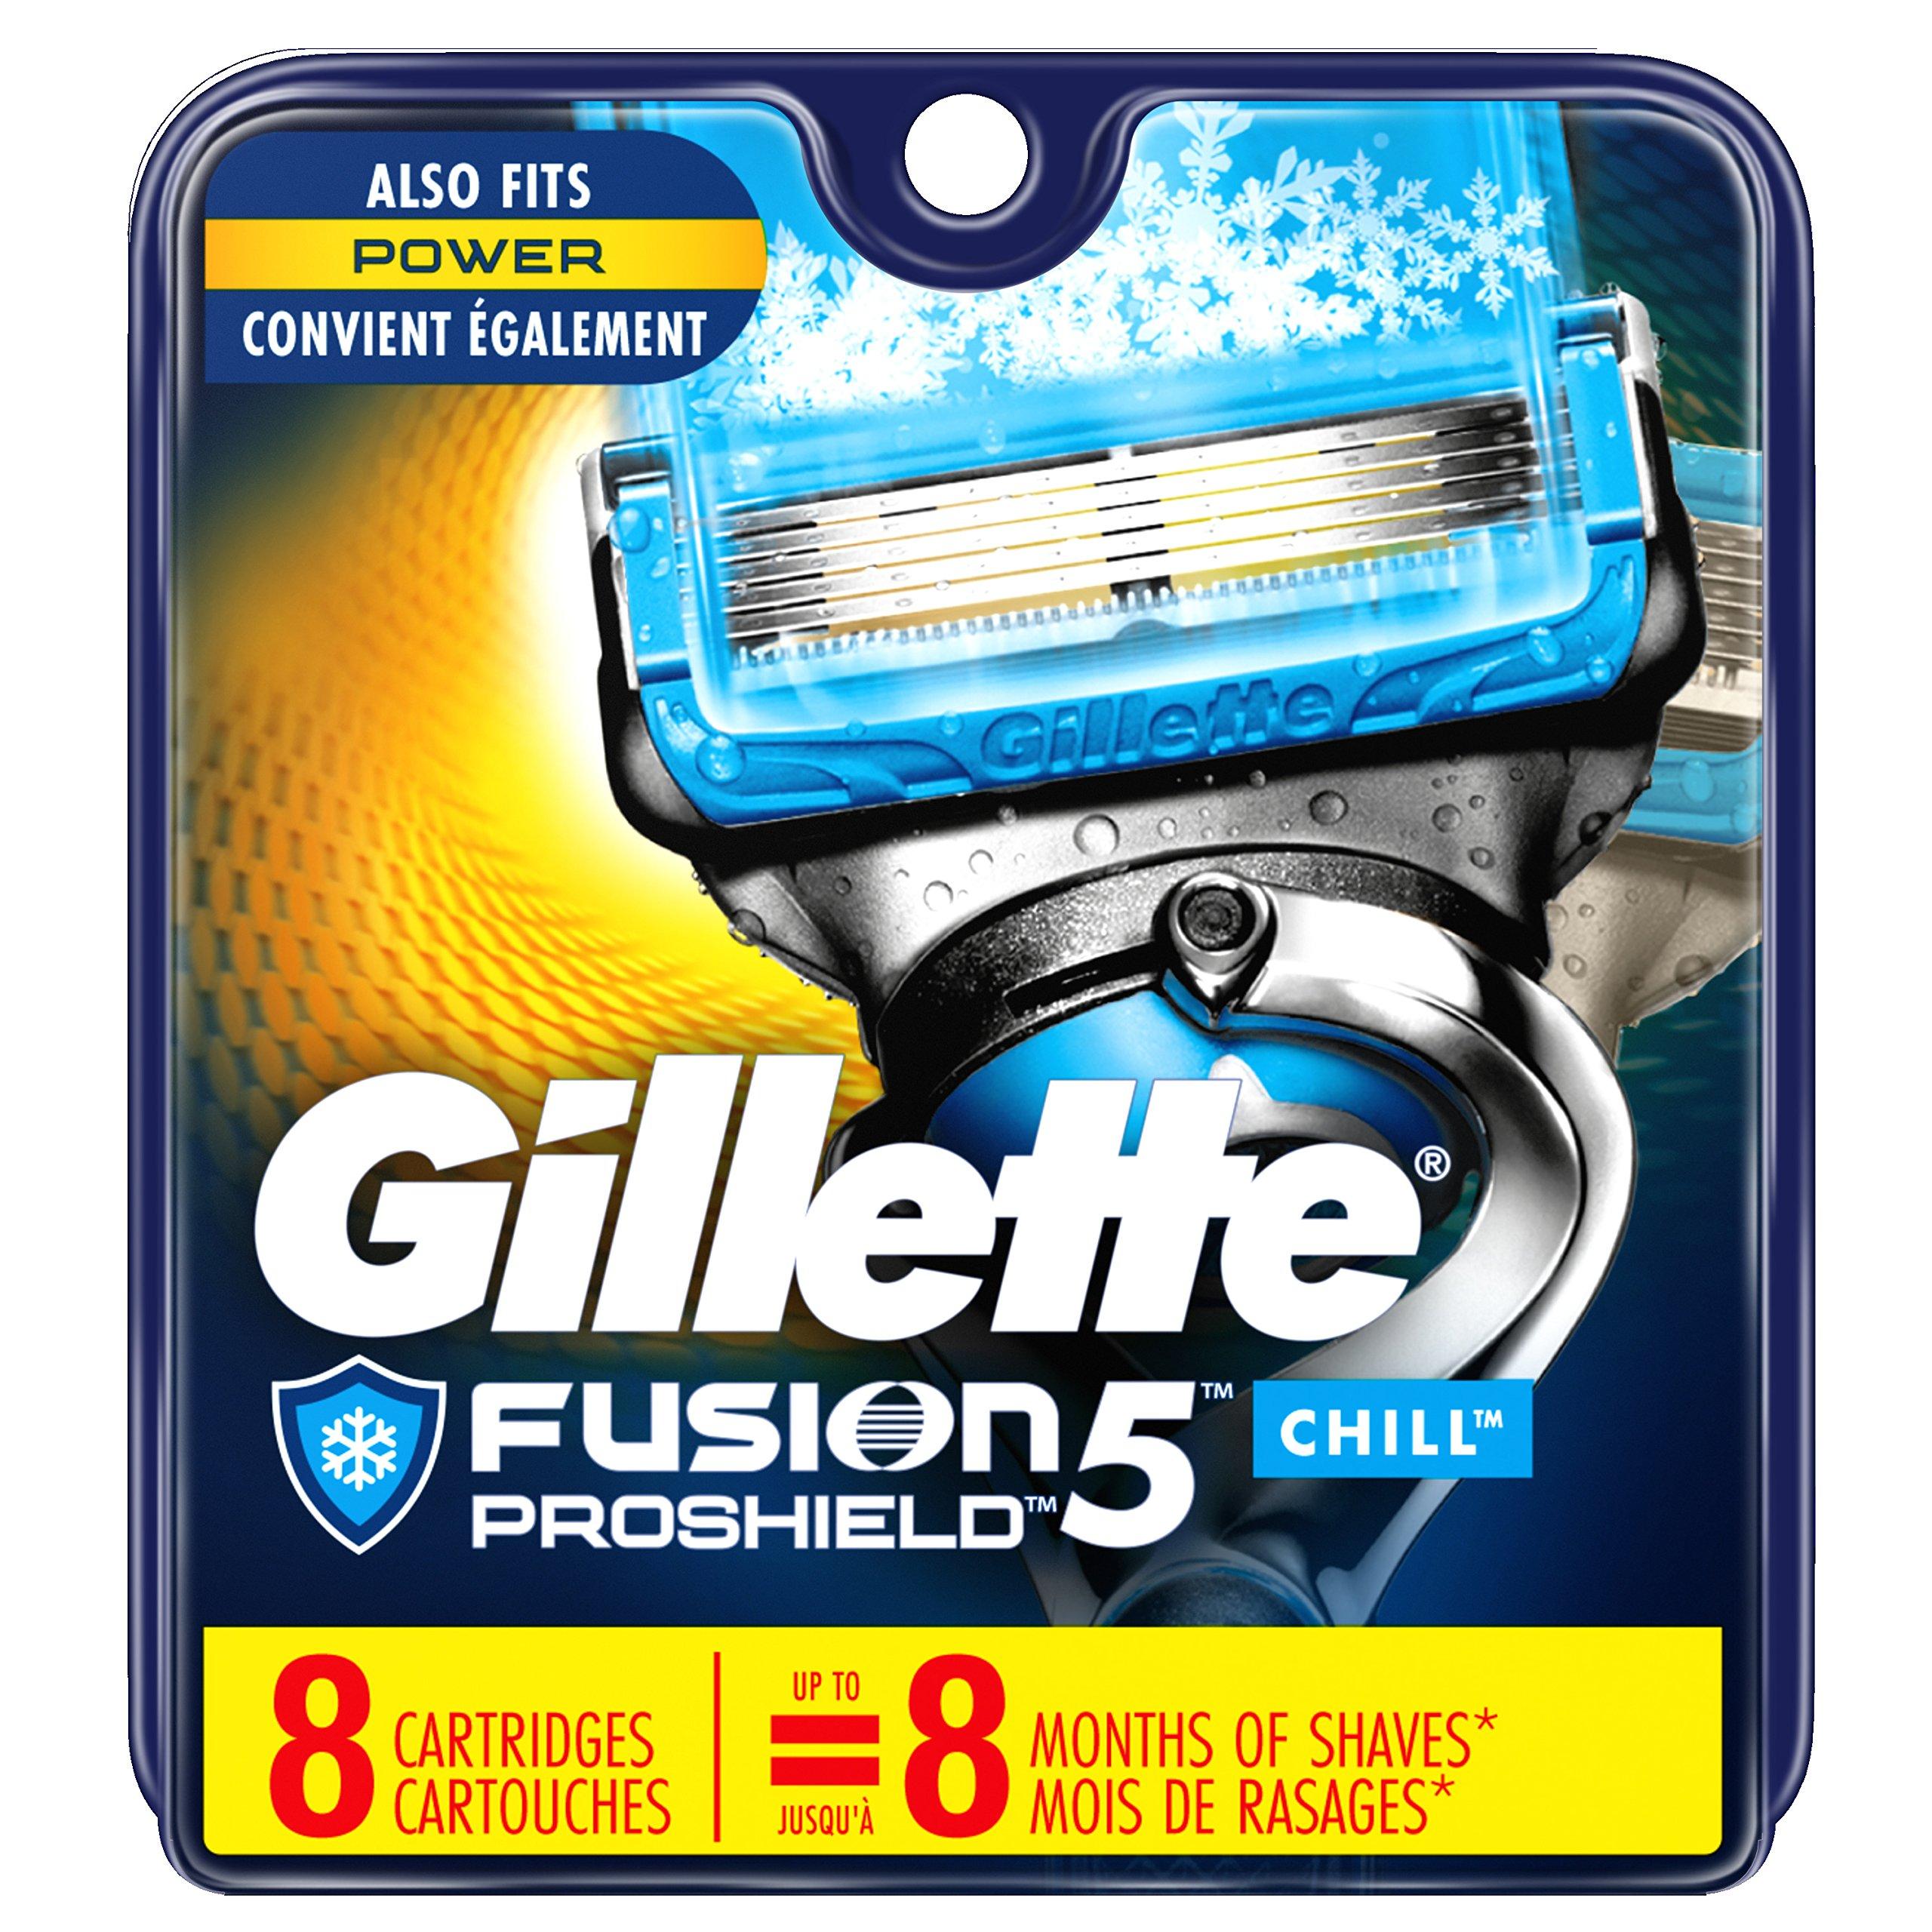 Gillette Fusion ProShield Chill Men's Razor Blade Refills, 8 Refills, Mens Razors / Blades by Gillette